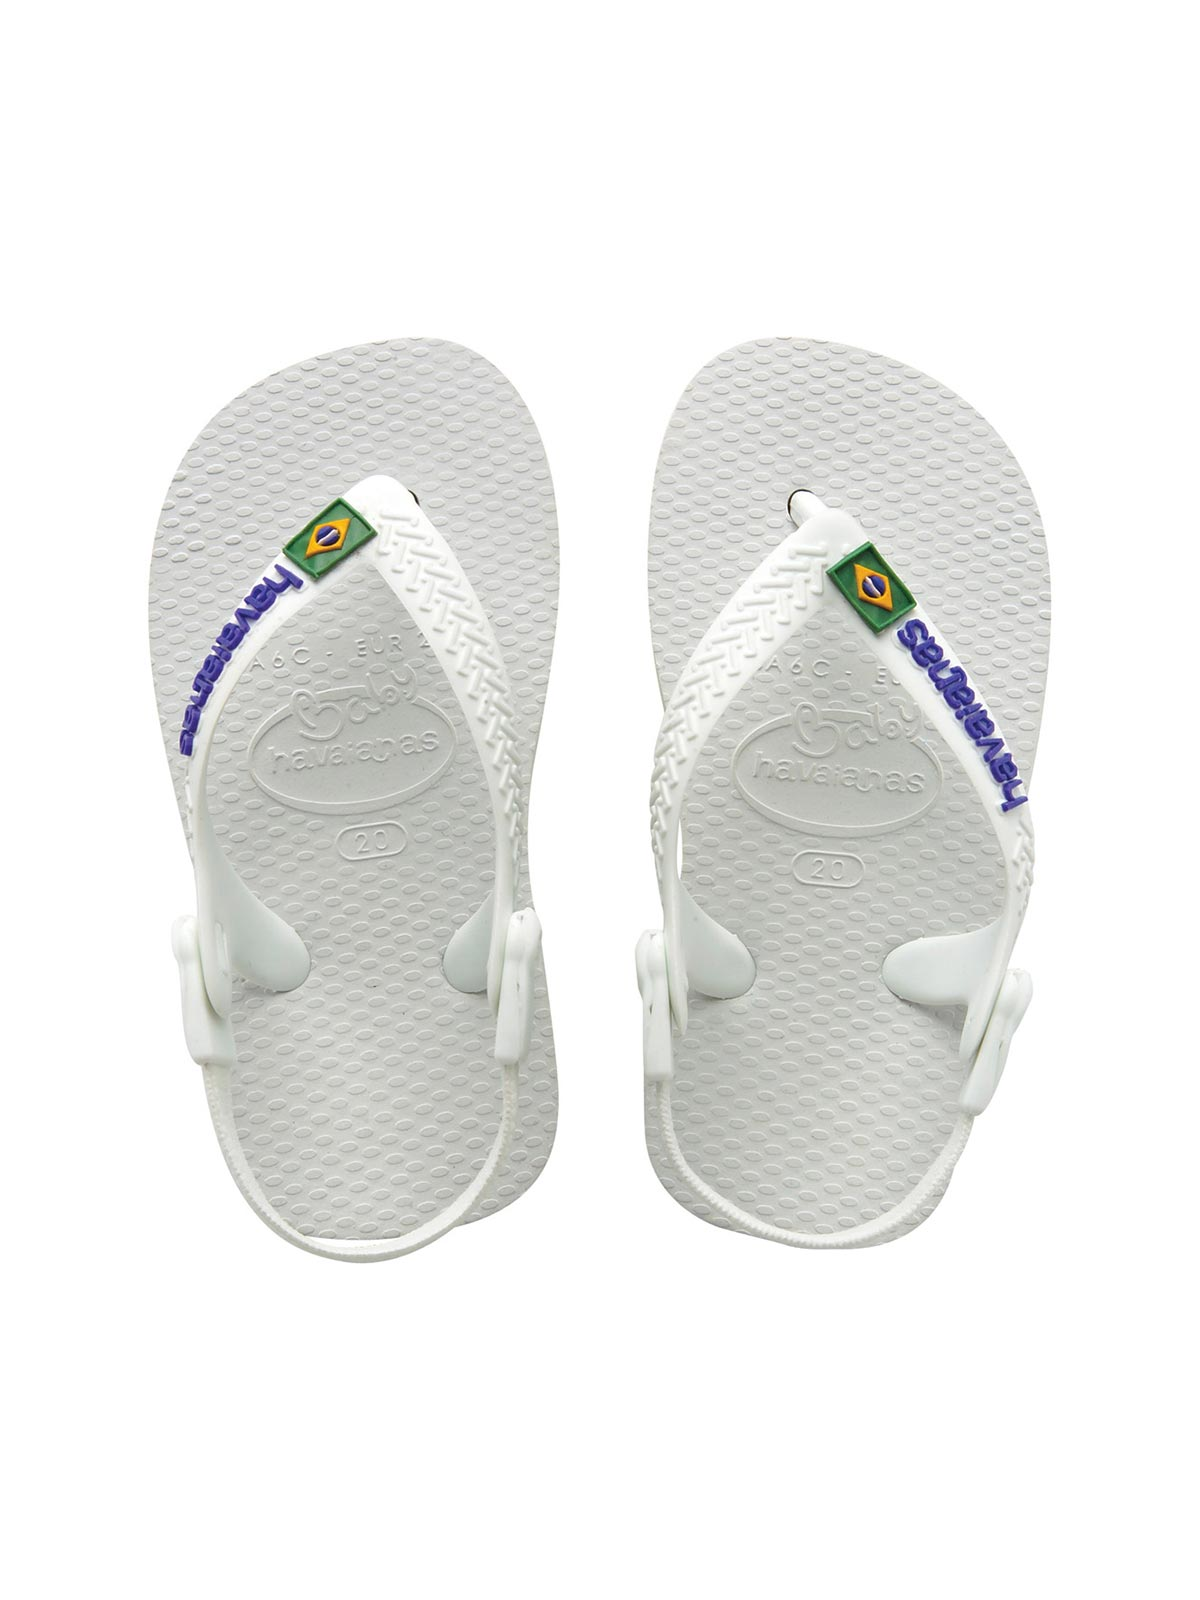 5703b7b133df9 Flip-Flops Flip-flops - Baby Brasil Logo White white - Brand Havaianas